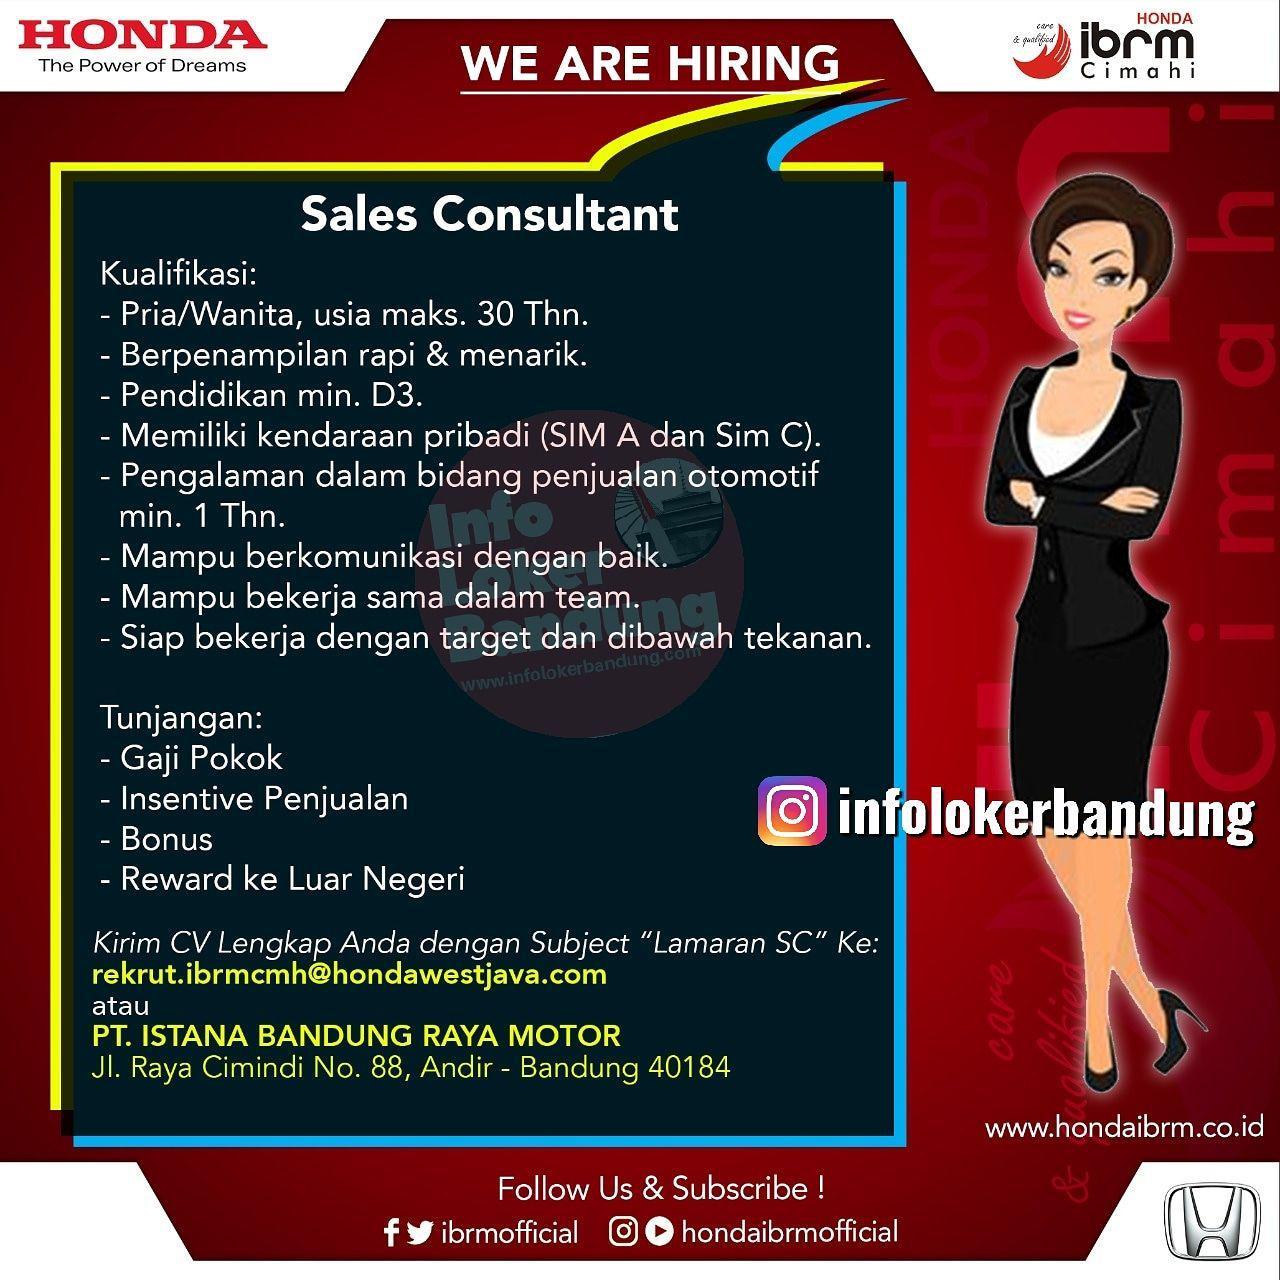 Lowongan Kerja Sales Consultant Honda IBRM Cimahi Juni 2019